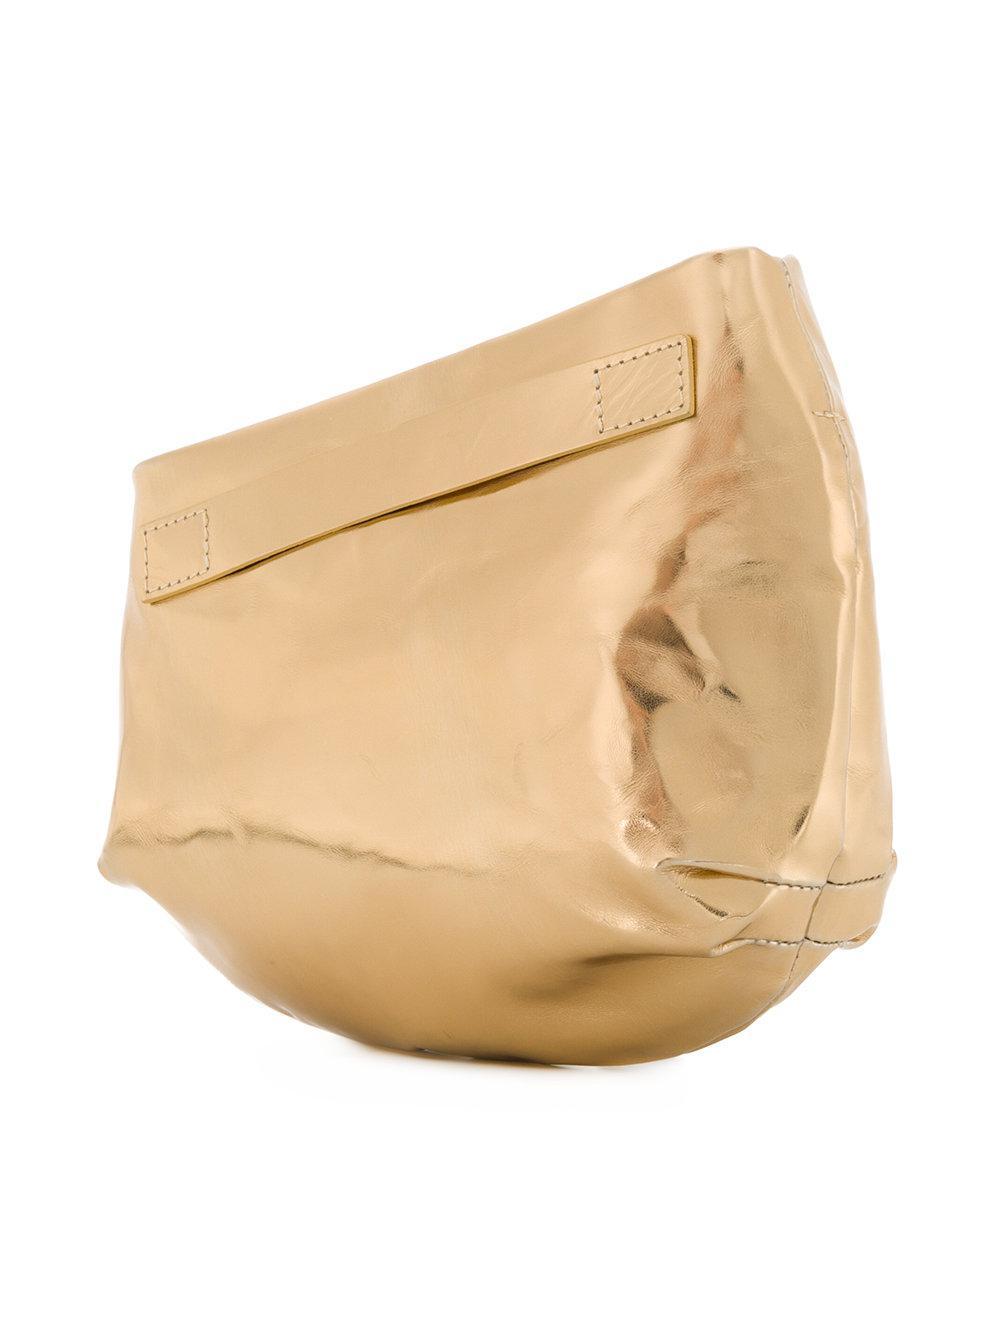 Gobetta Metallic In Shoulder Lyst Bag Marsèll Small Yqpf8wxWE1